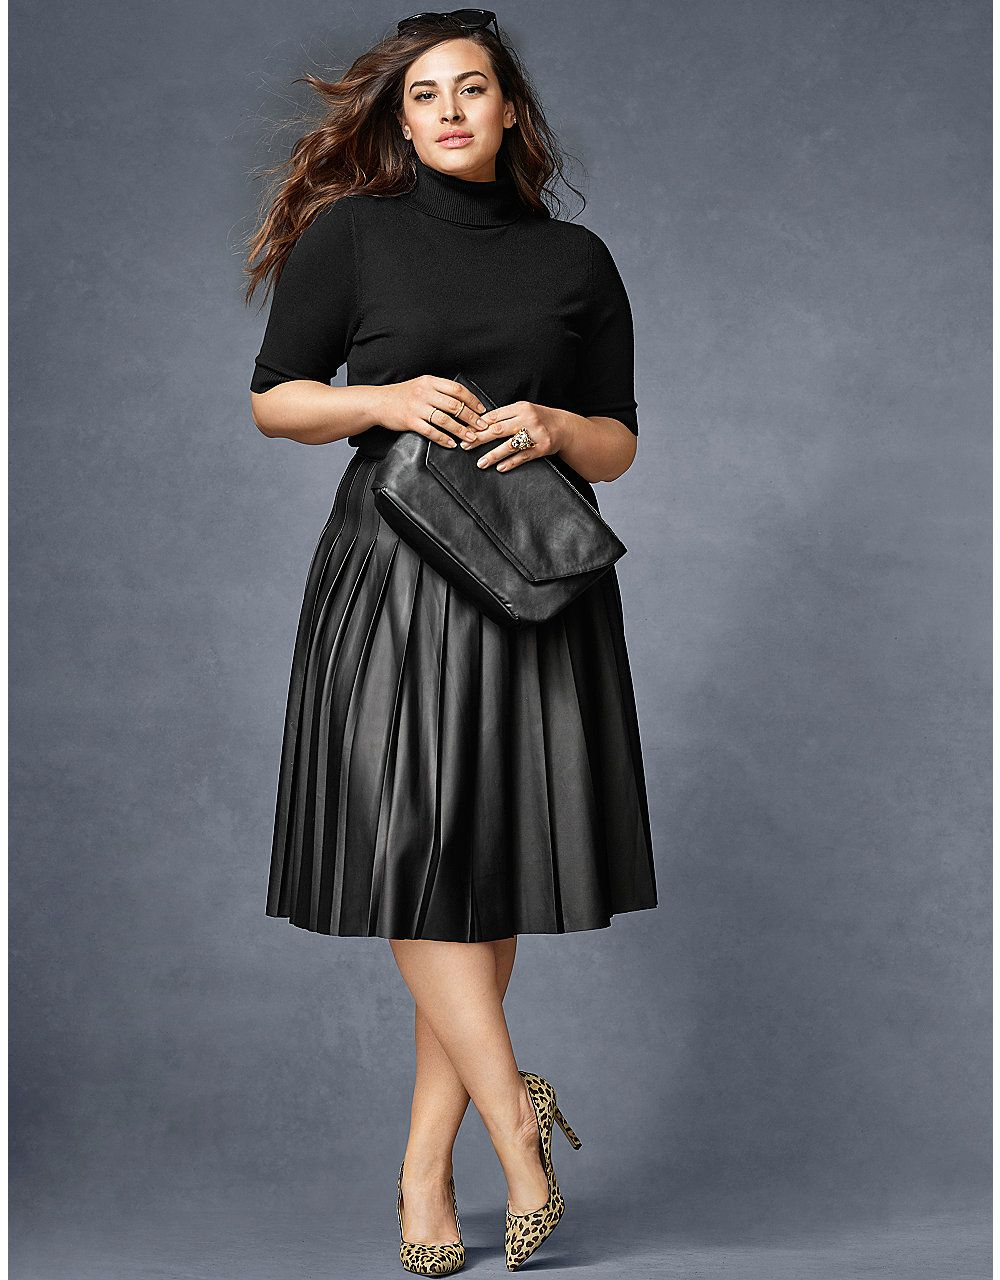 Plus Size Leather Skirt Long | Huston Fislar Photography